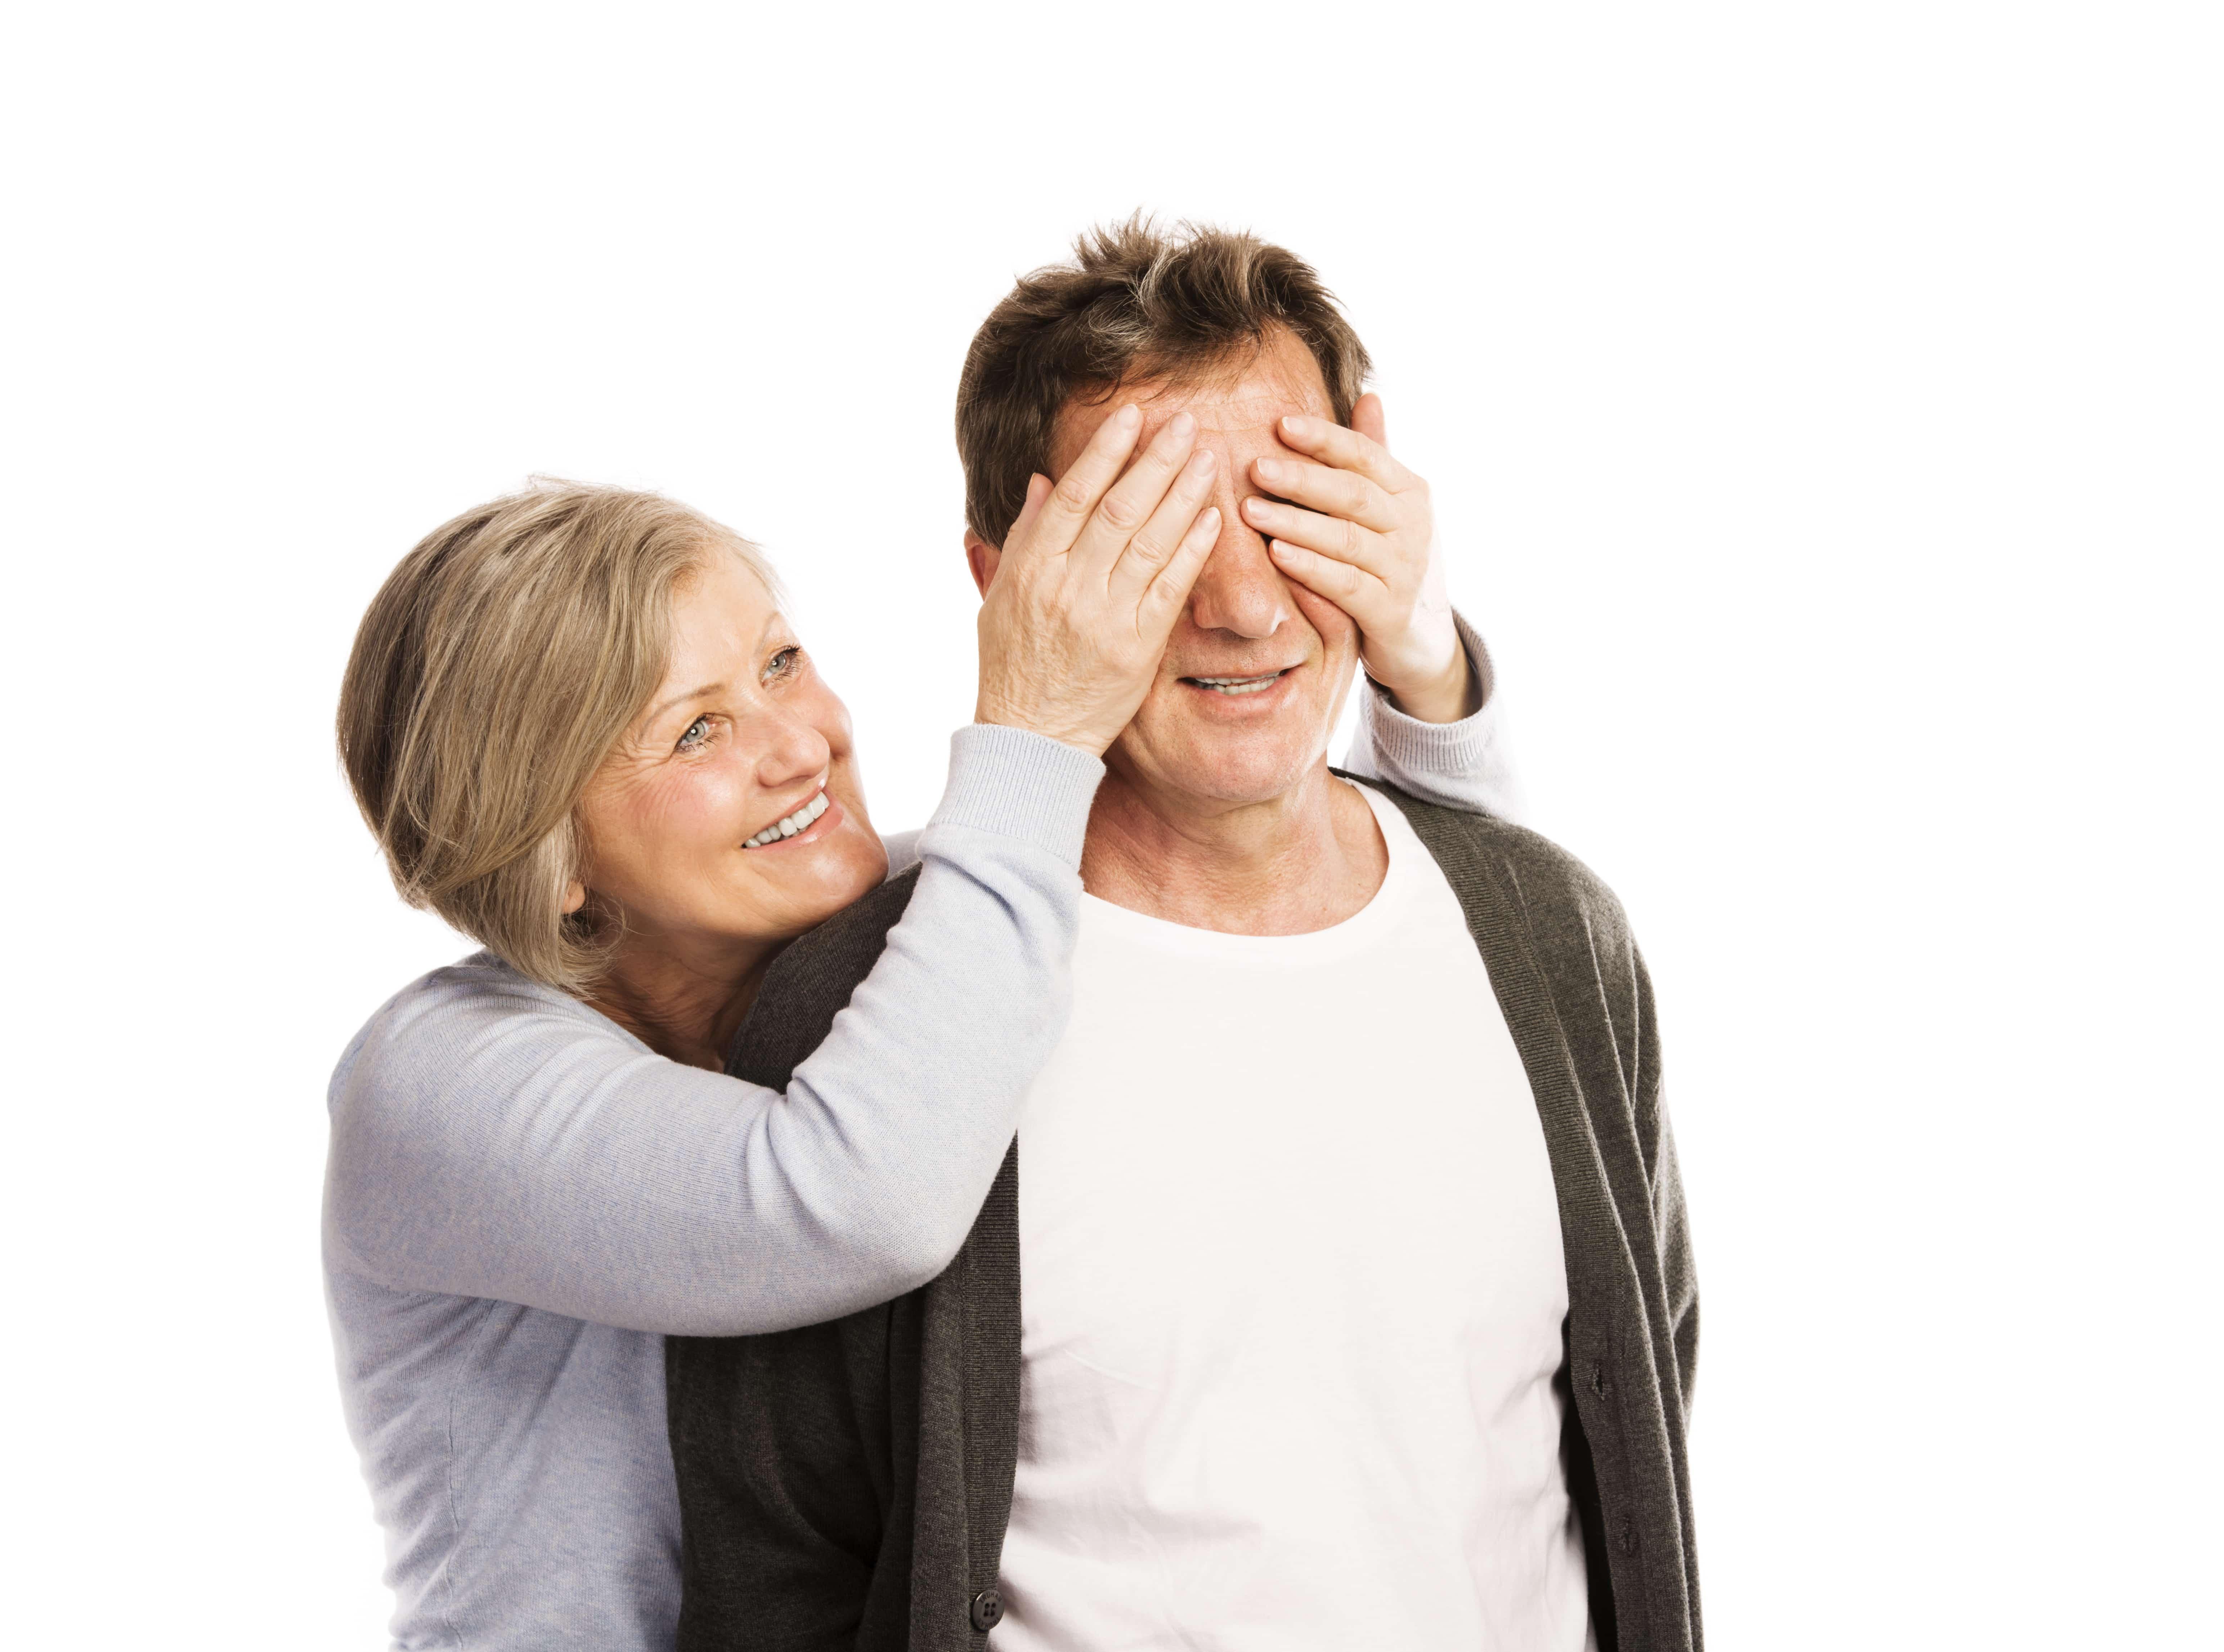 Studio portrait of happy seniors couple having fun. Isolated on white background.